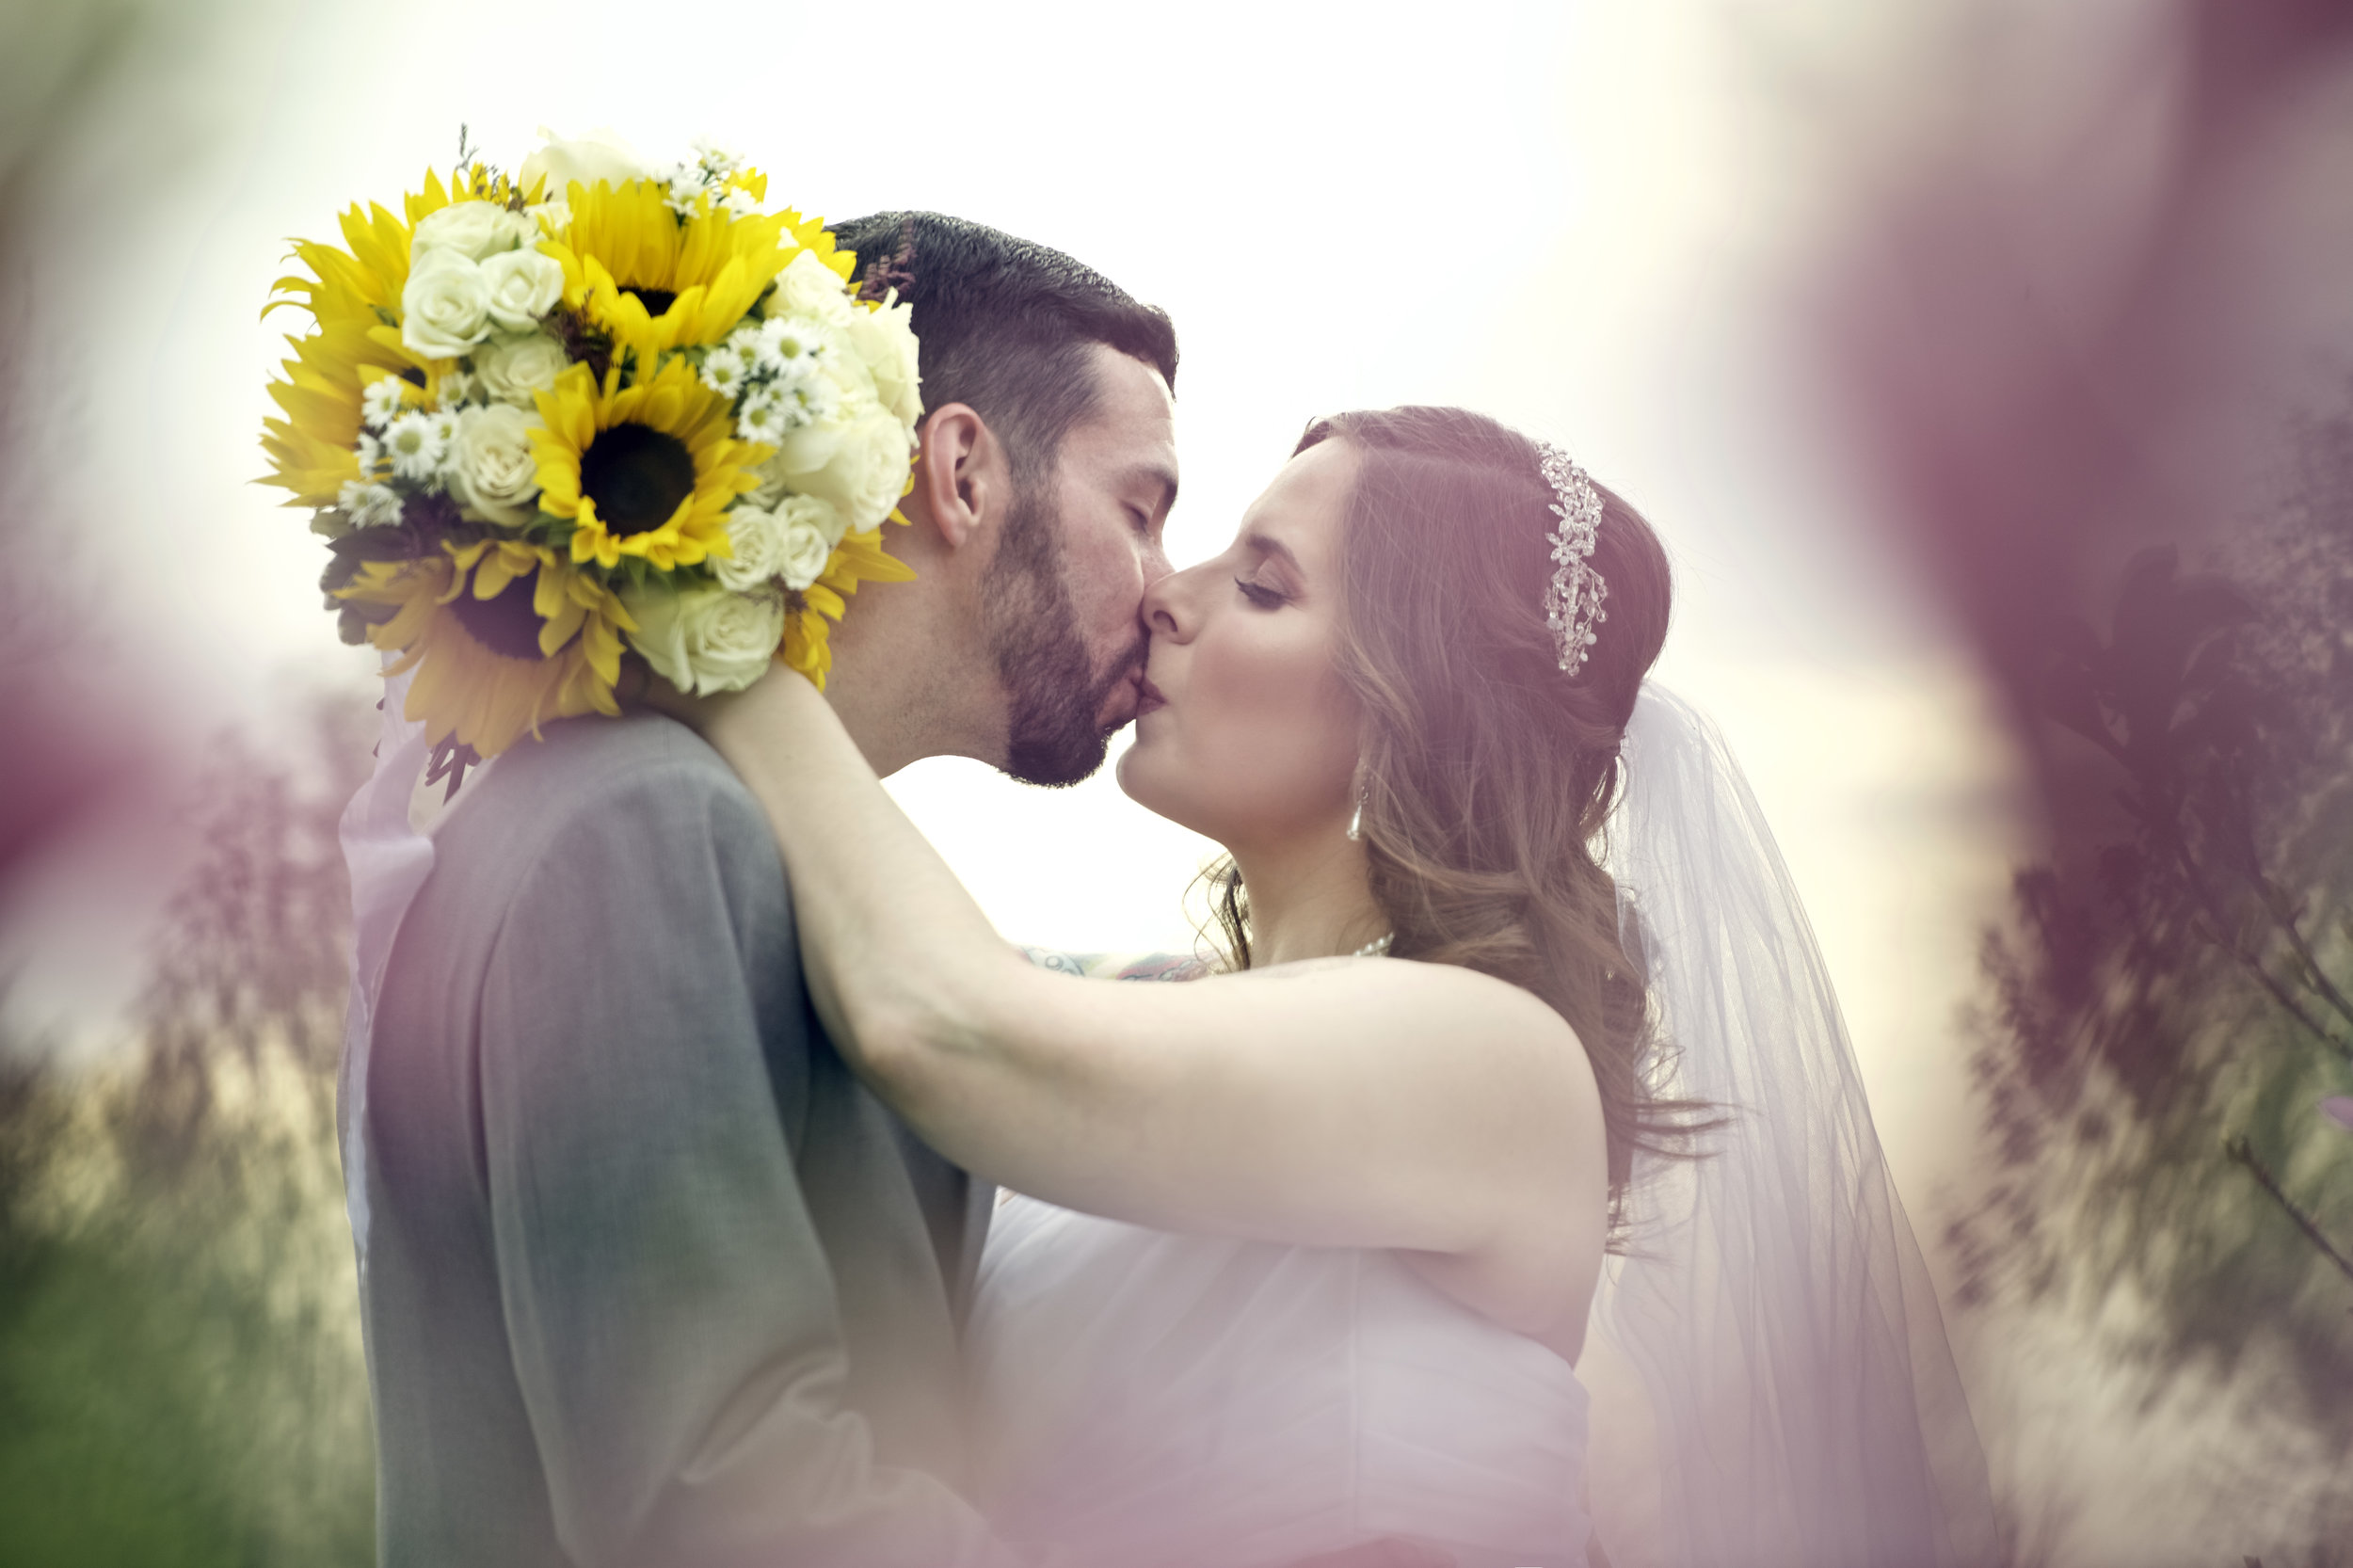 Lippincott manor wedding, wallkill ny wedding, photography, photos r.jpg